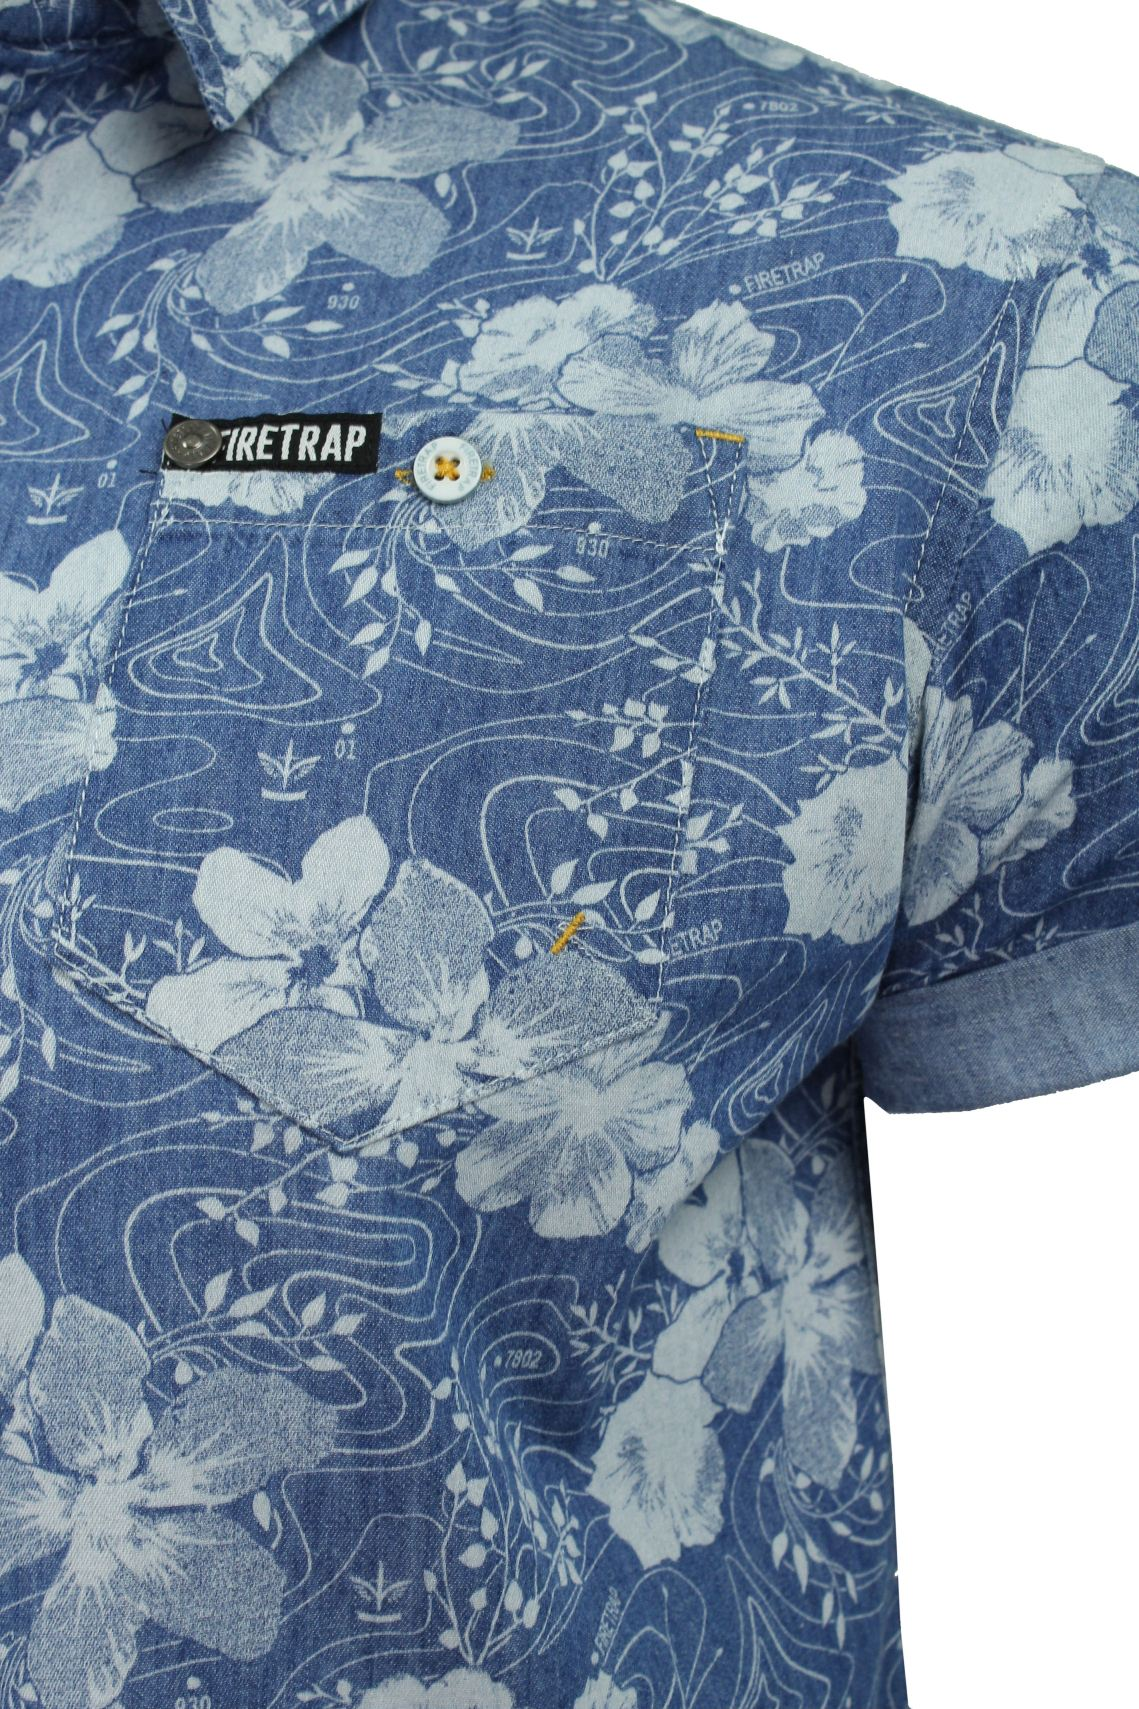 Mens-Short-Sleeved-Shirt-by-Firetrap thumbnail 19